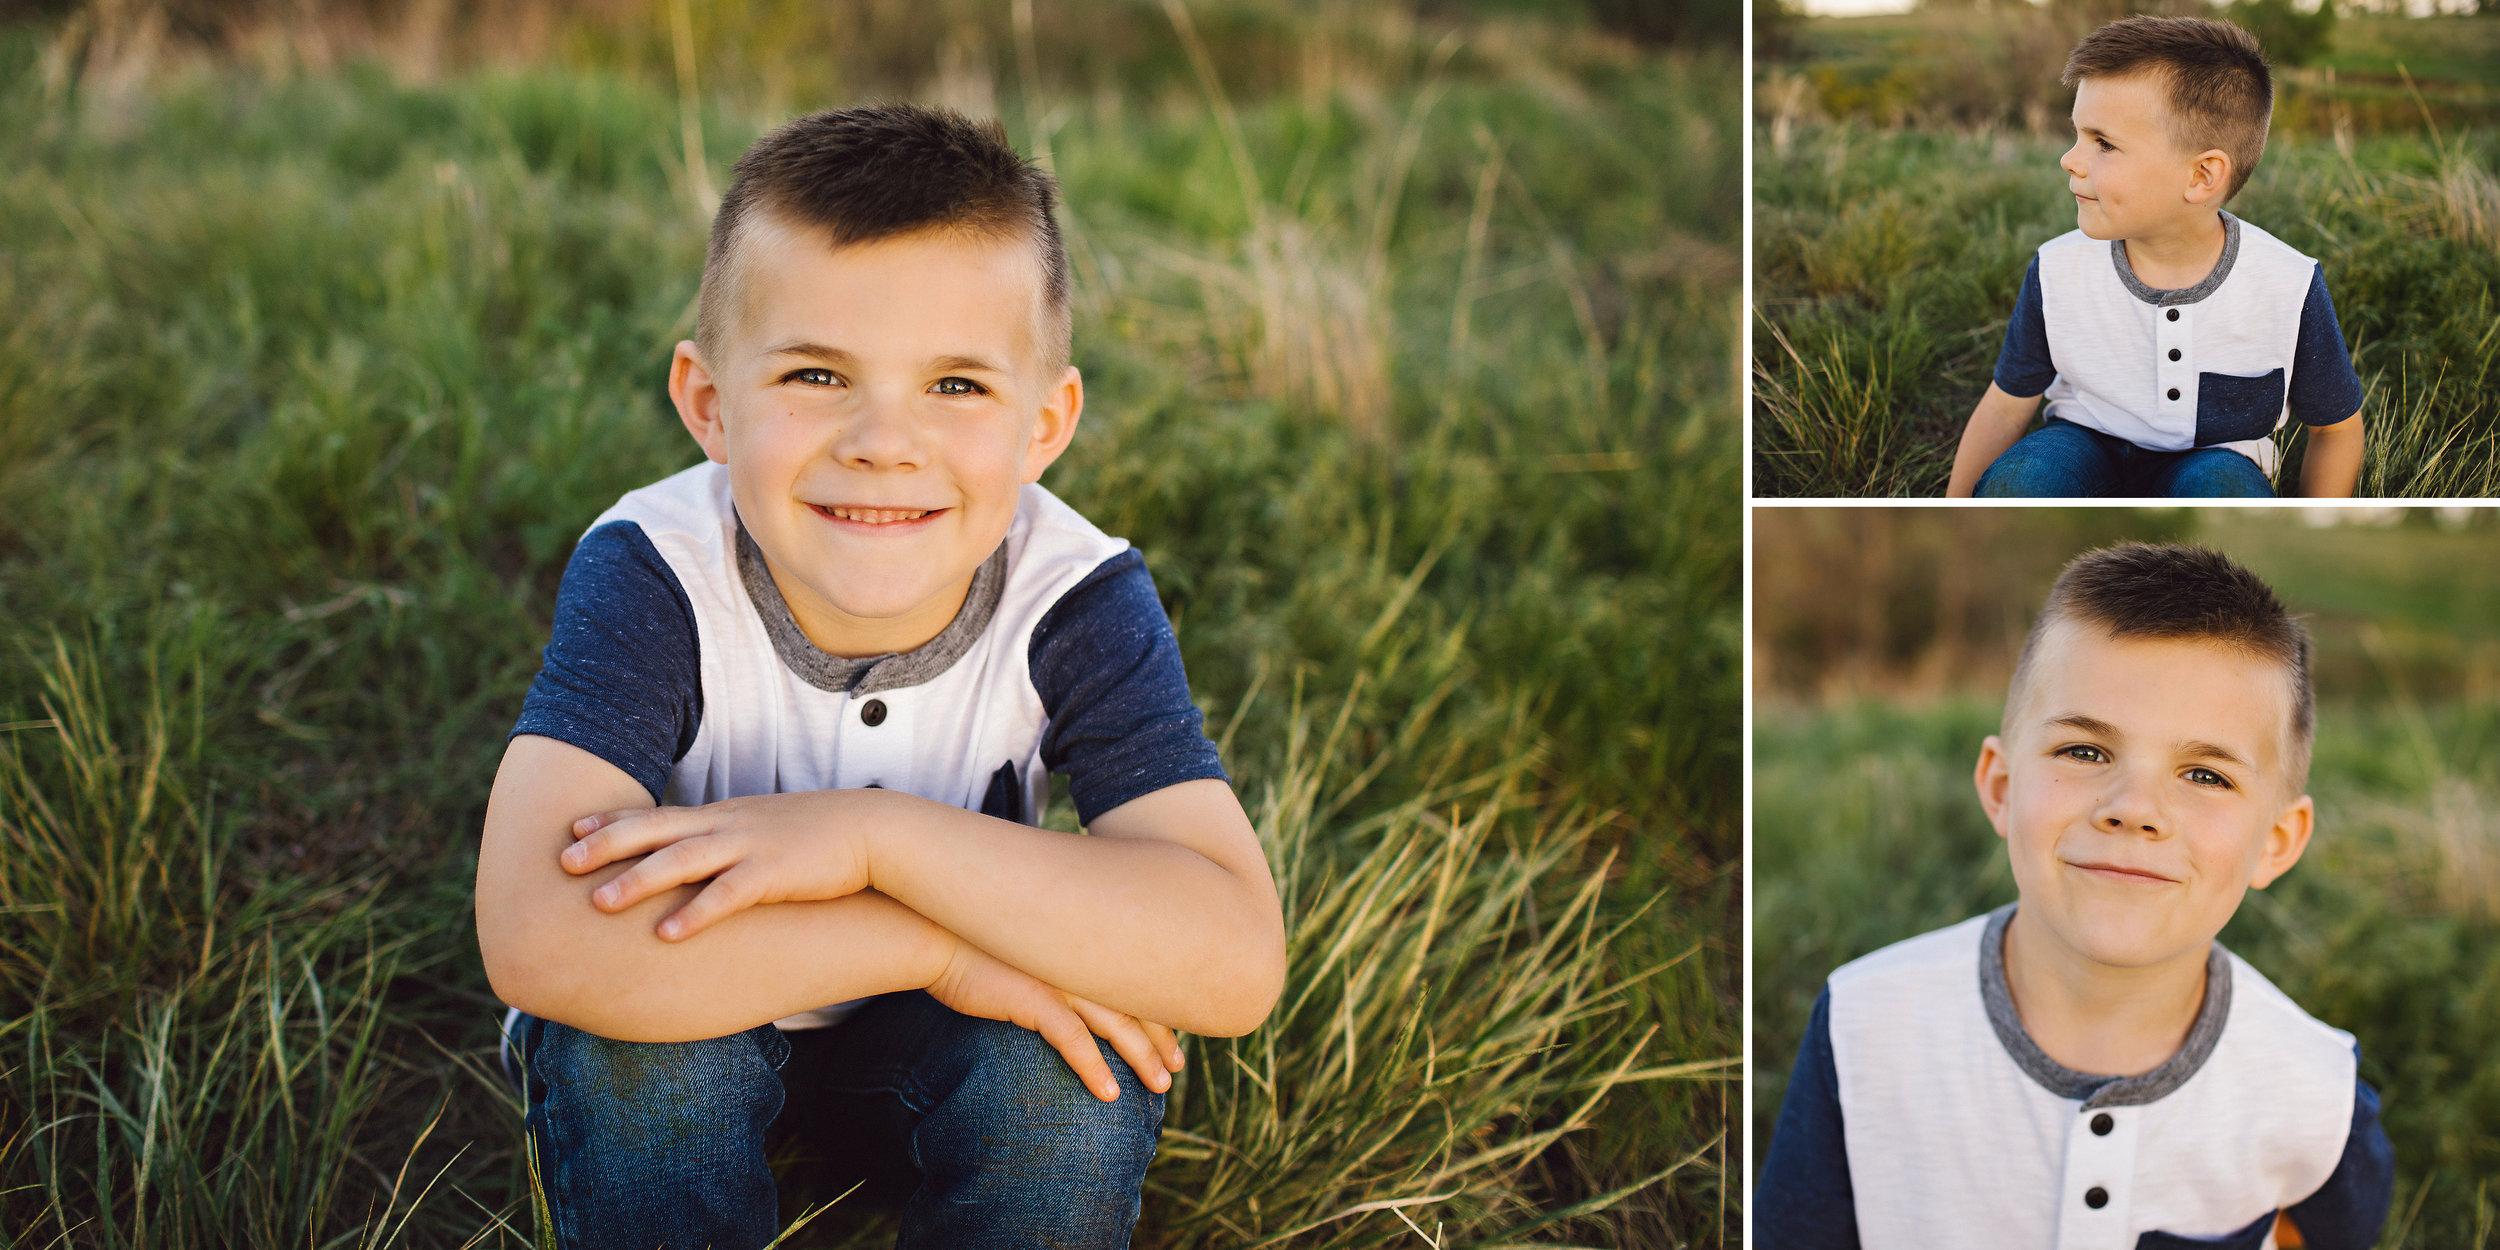 children's photographer in Great Falls